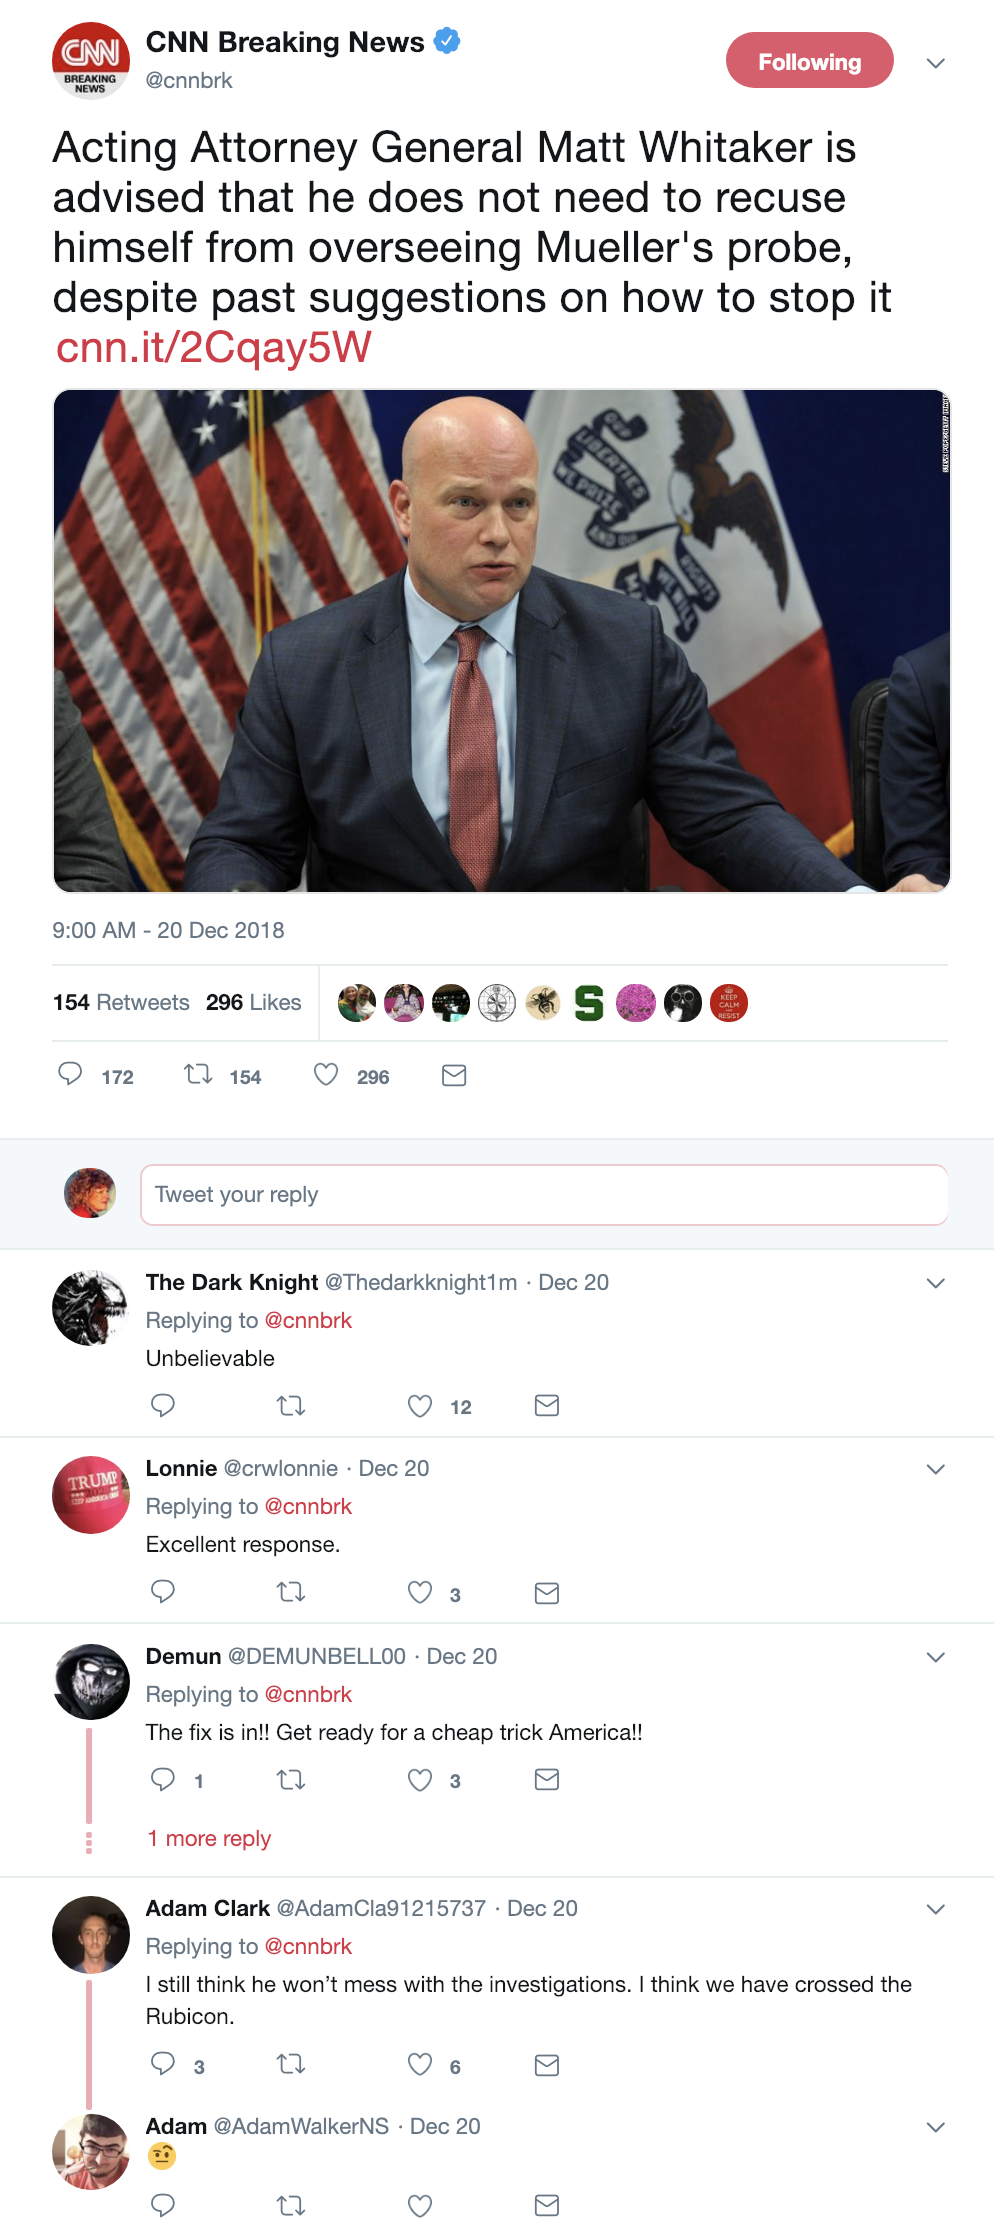 Screen-Shot-2018-12-24-at-10.00.15-AM.png?zoom=2 Adam Schiff Goes On CNN & Makes Bypass Of Matt Whitaker Statement To America Corruption Crime Donald Trump Mueller Politics Robert Mueller Russia Top Stories